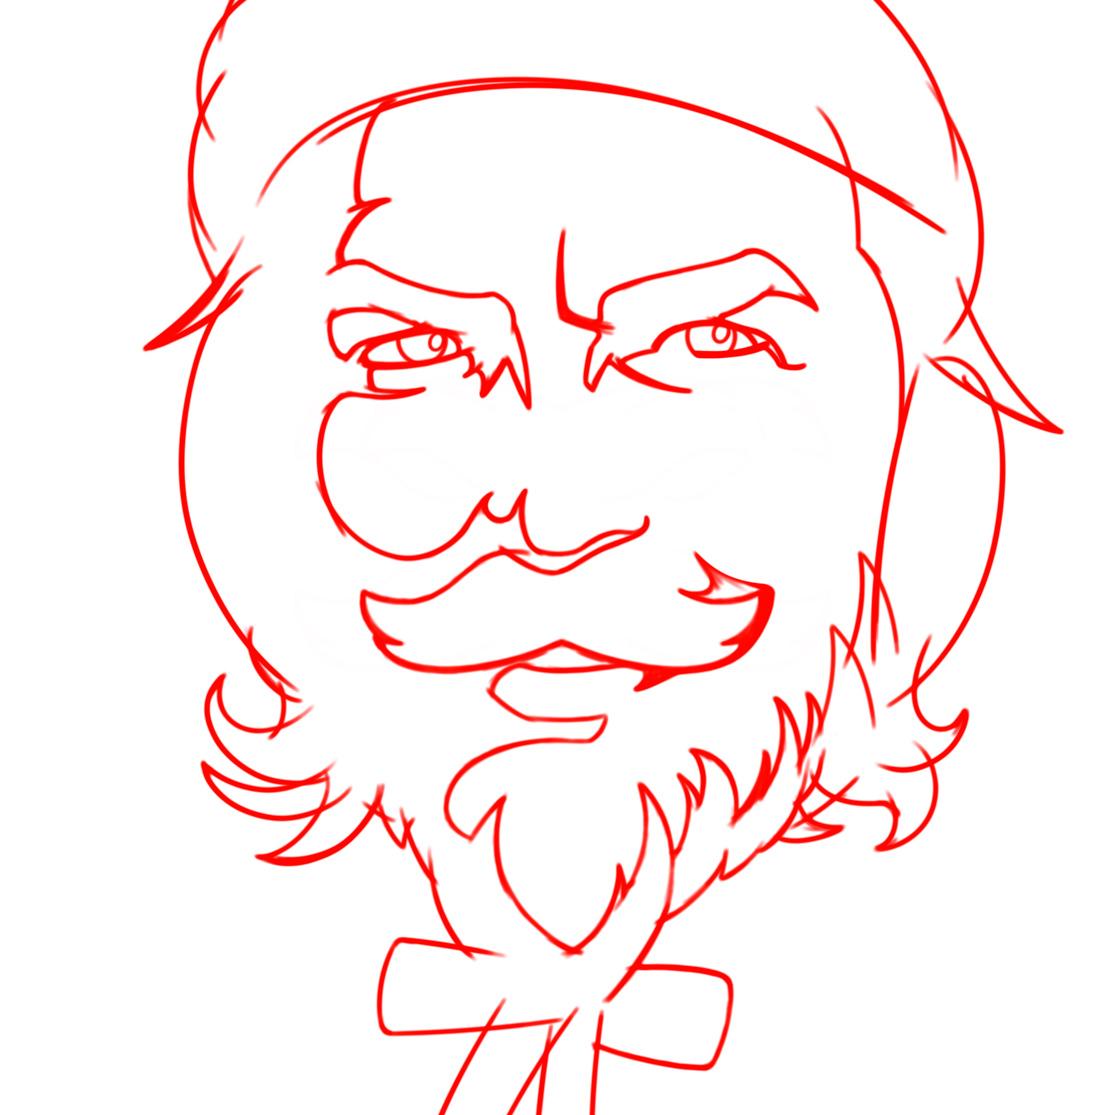 KFCHE Digital Sketch